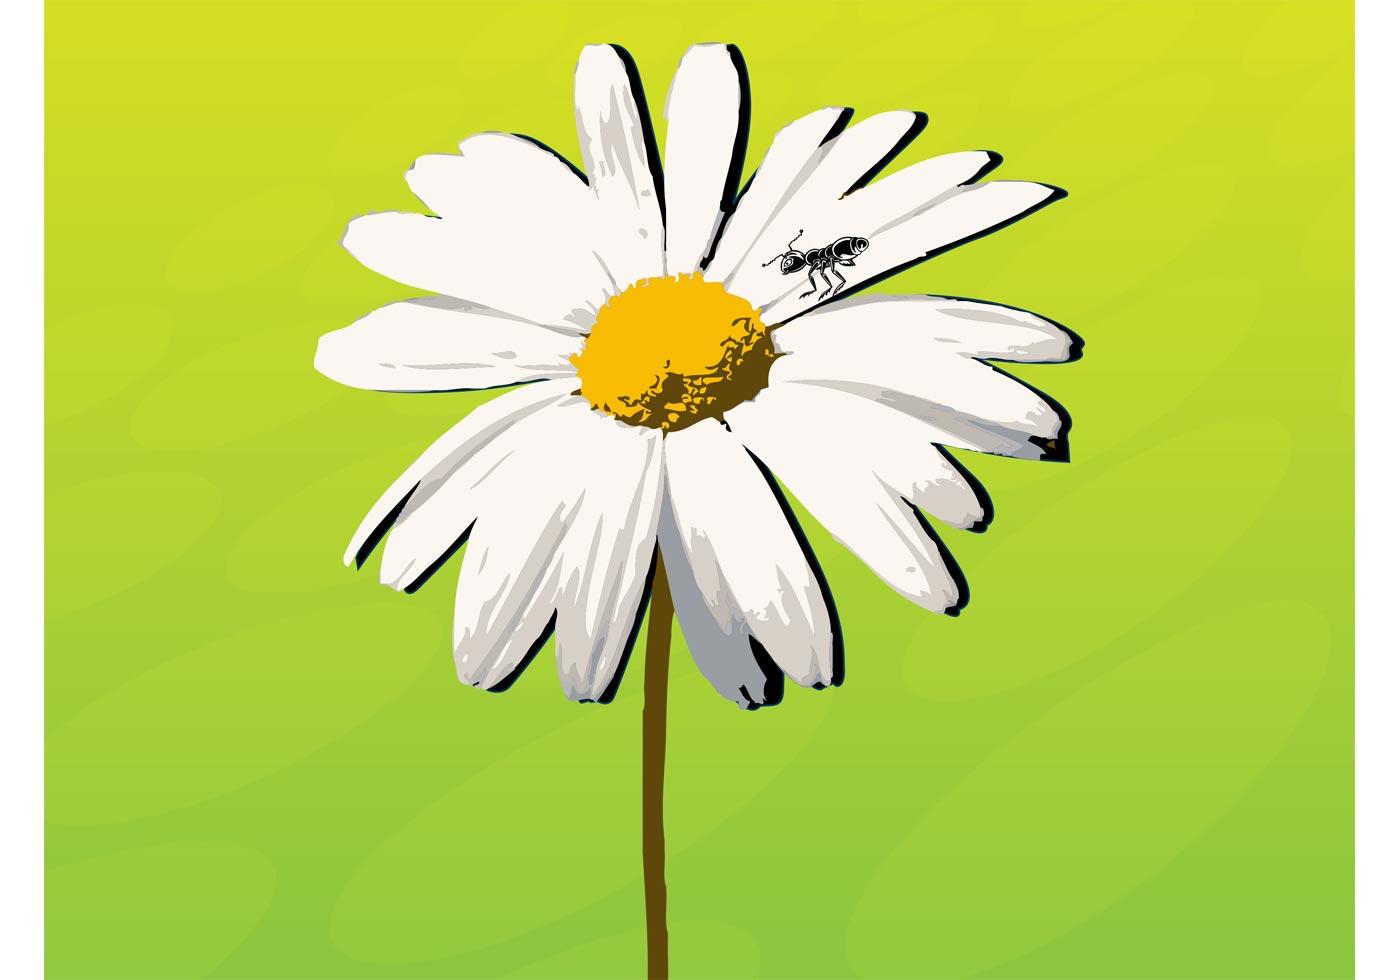 Daisy Flower Free Vector Art 8766 Free Downloads